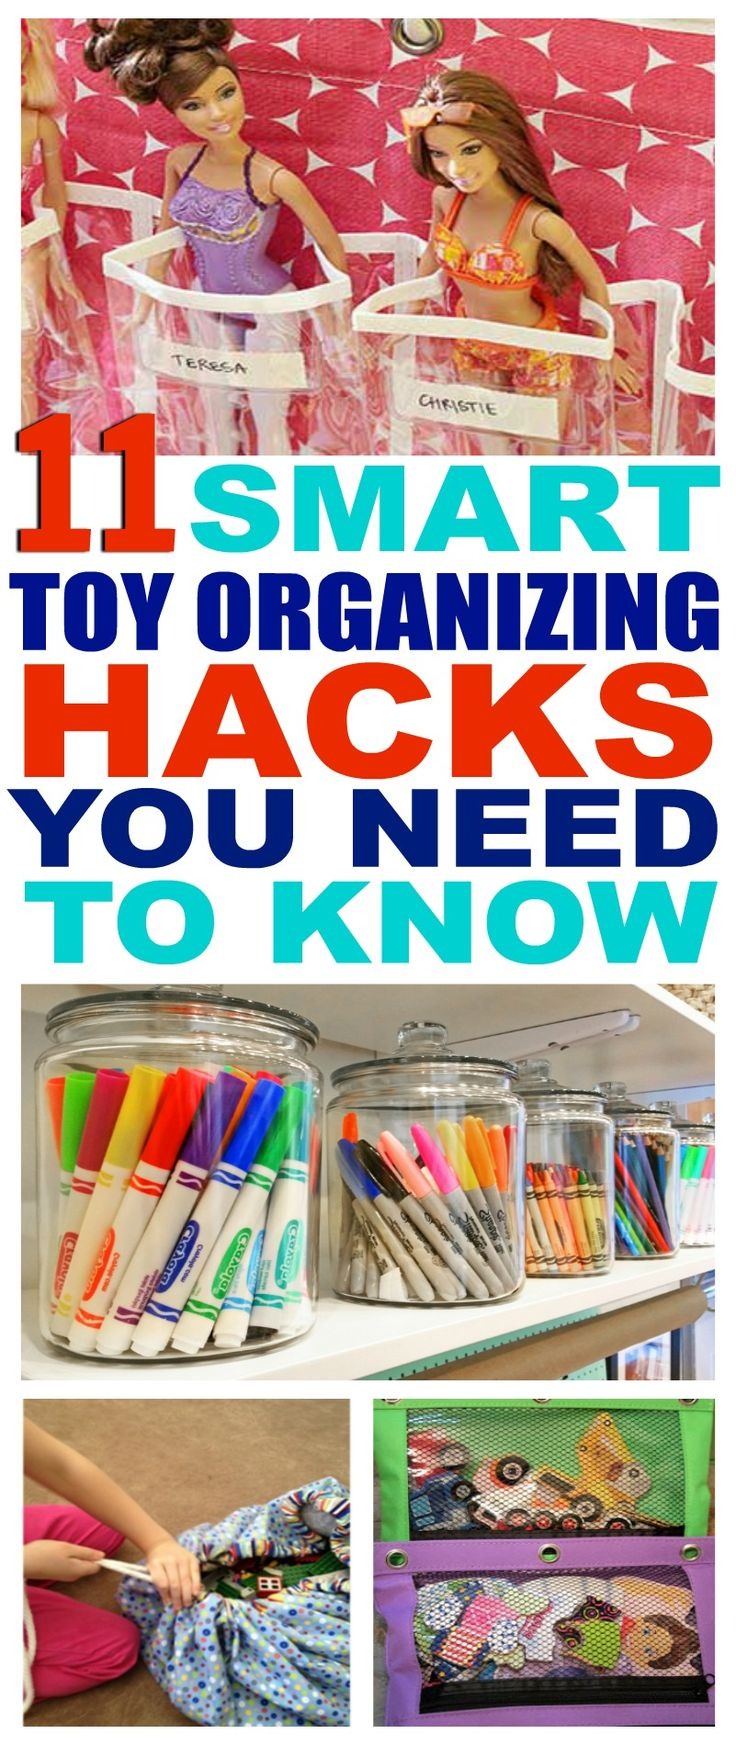 11 Genius Ways To Organize Kids' Stuff So You Won't Step On Another Lego! - That Vintage Life